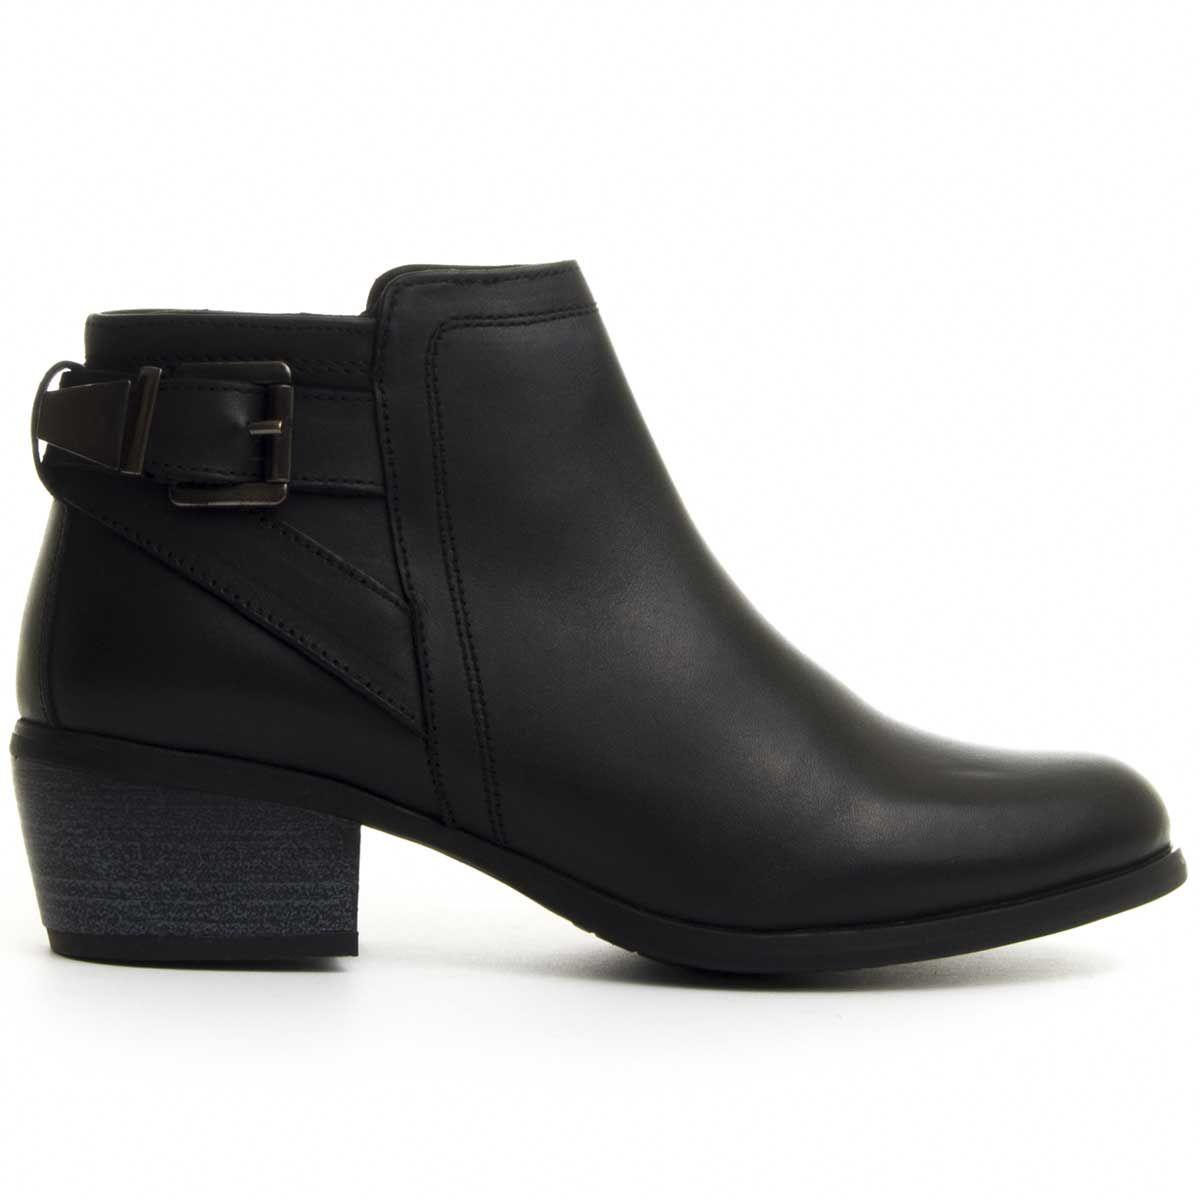 Purapiel Heeled Ankle Boot in Black